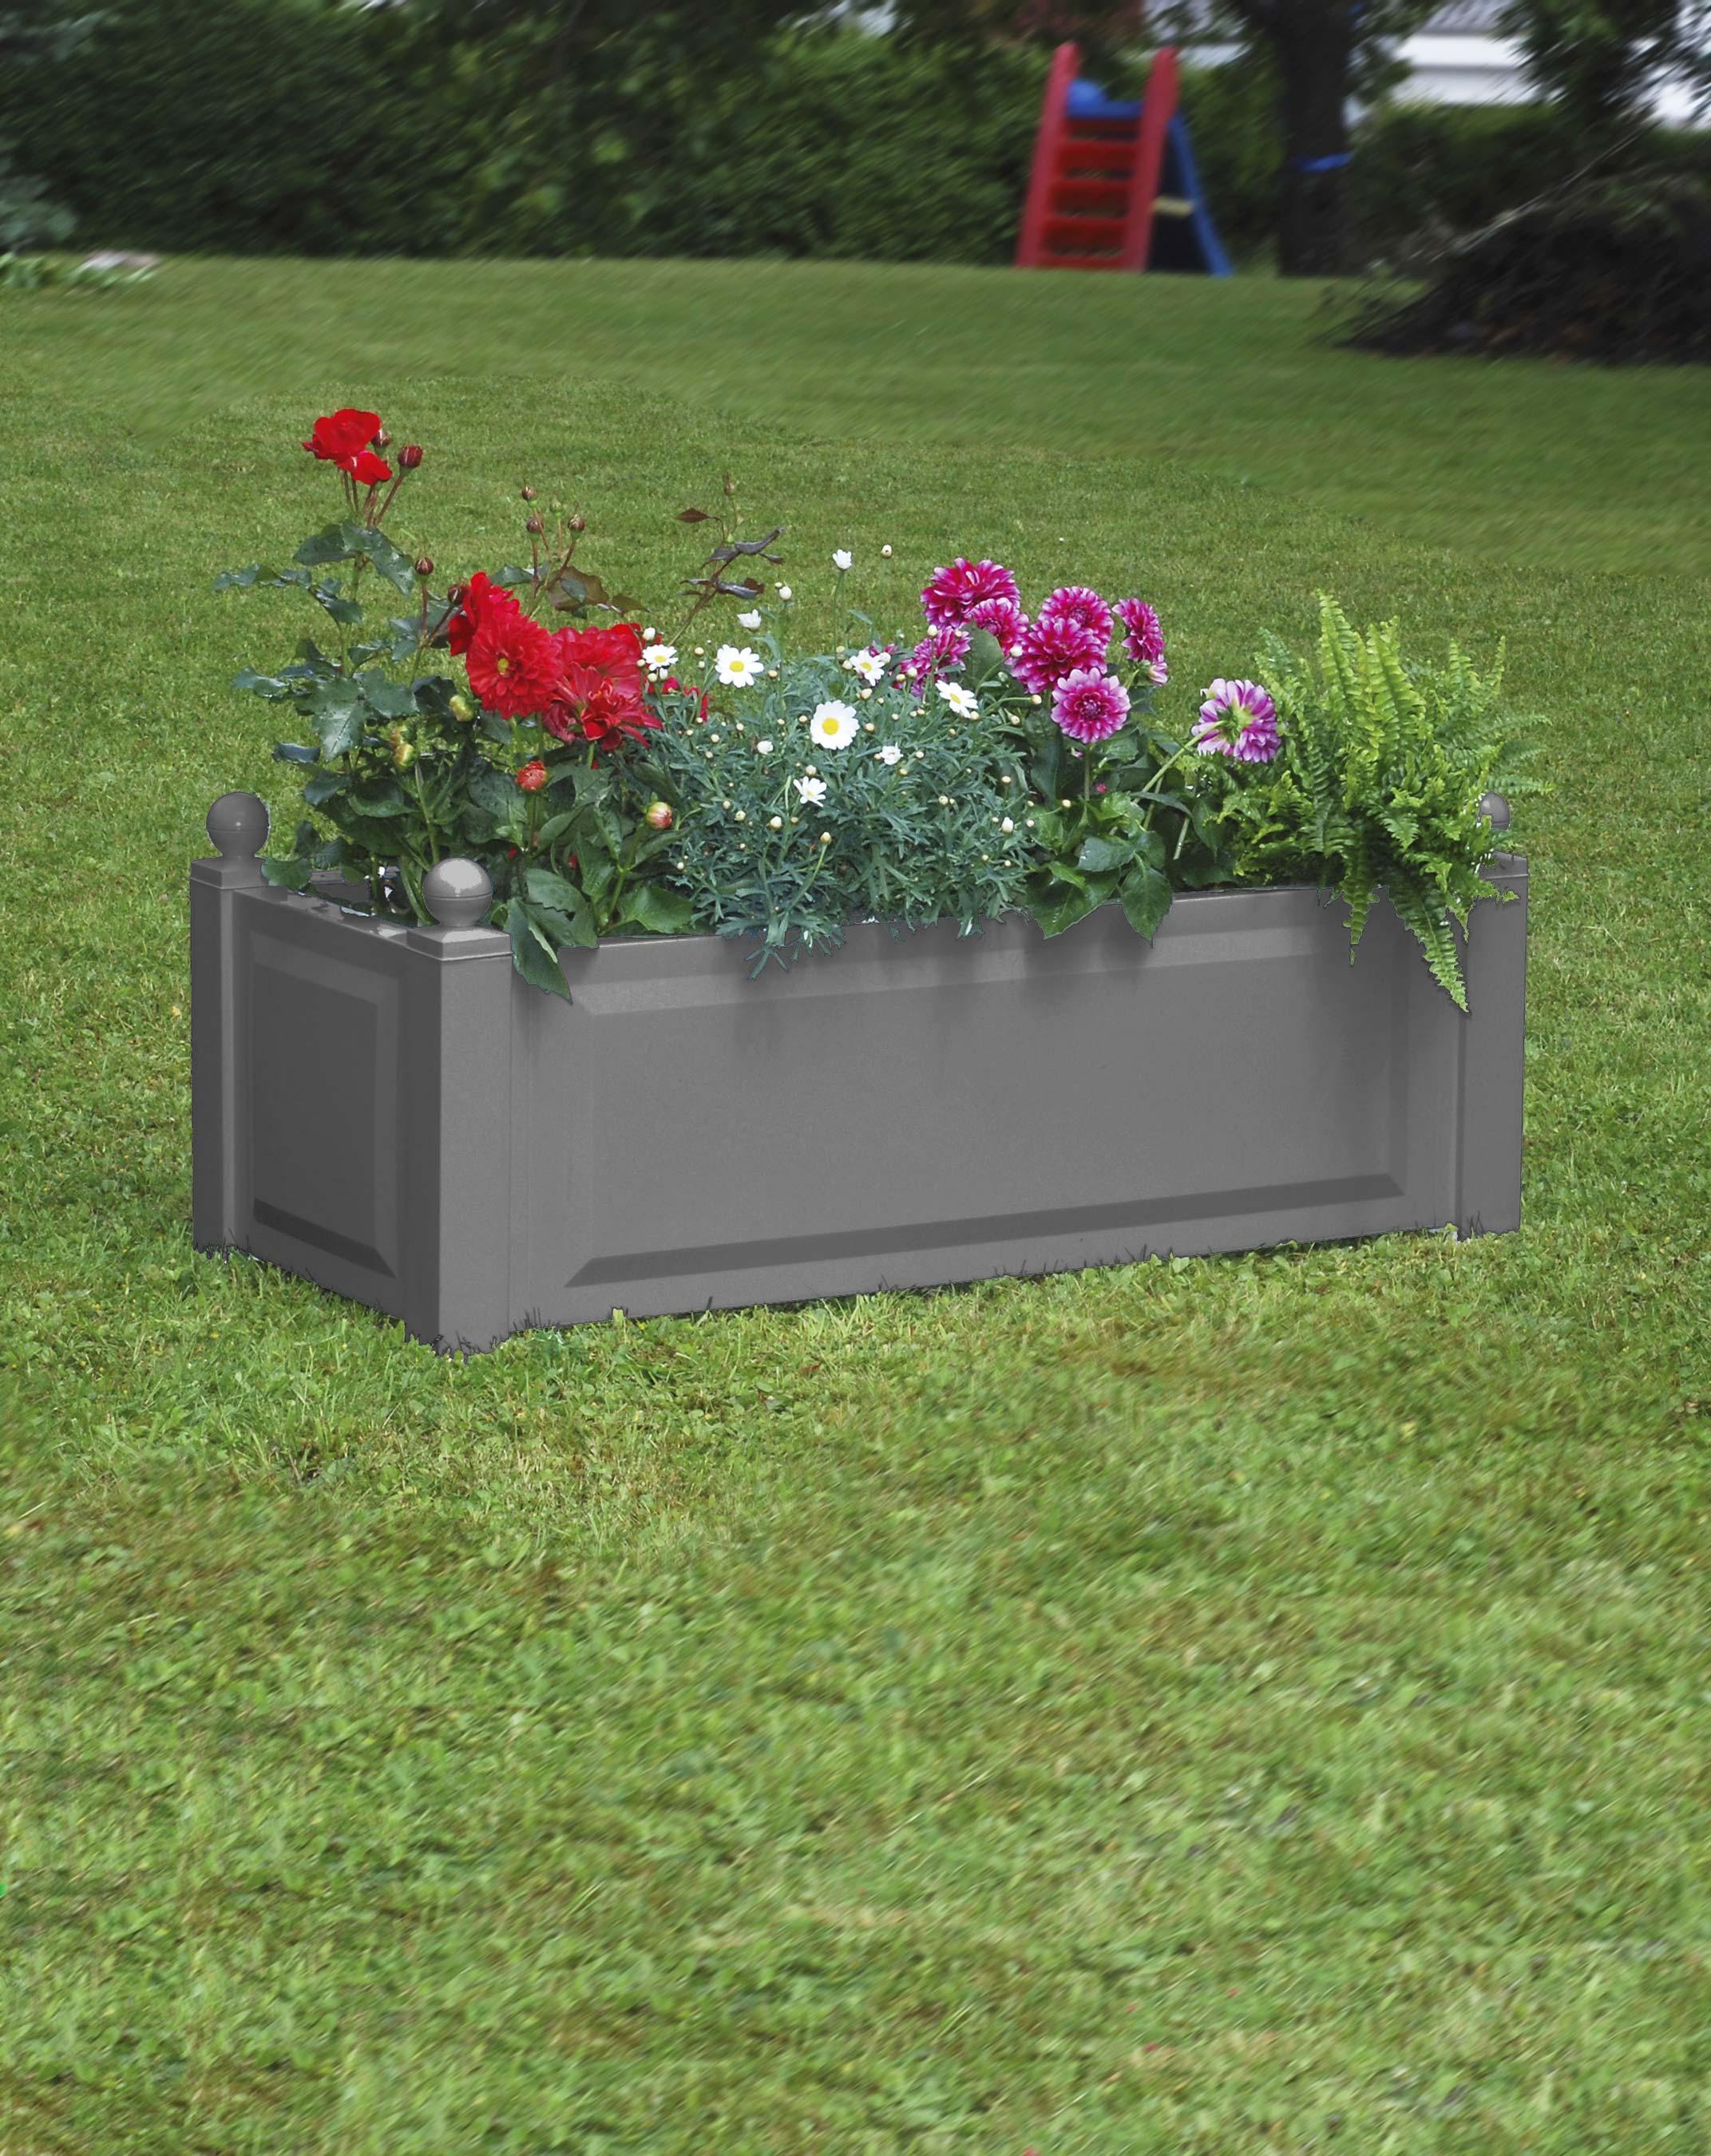 khw pflanzgef pflanzkasten kunststoff 100x43x40cm grau bei. Black Bedroom Furniture Sets. Home Design Ideas